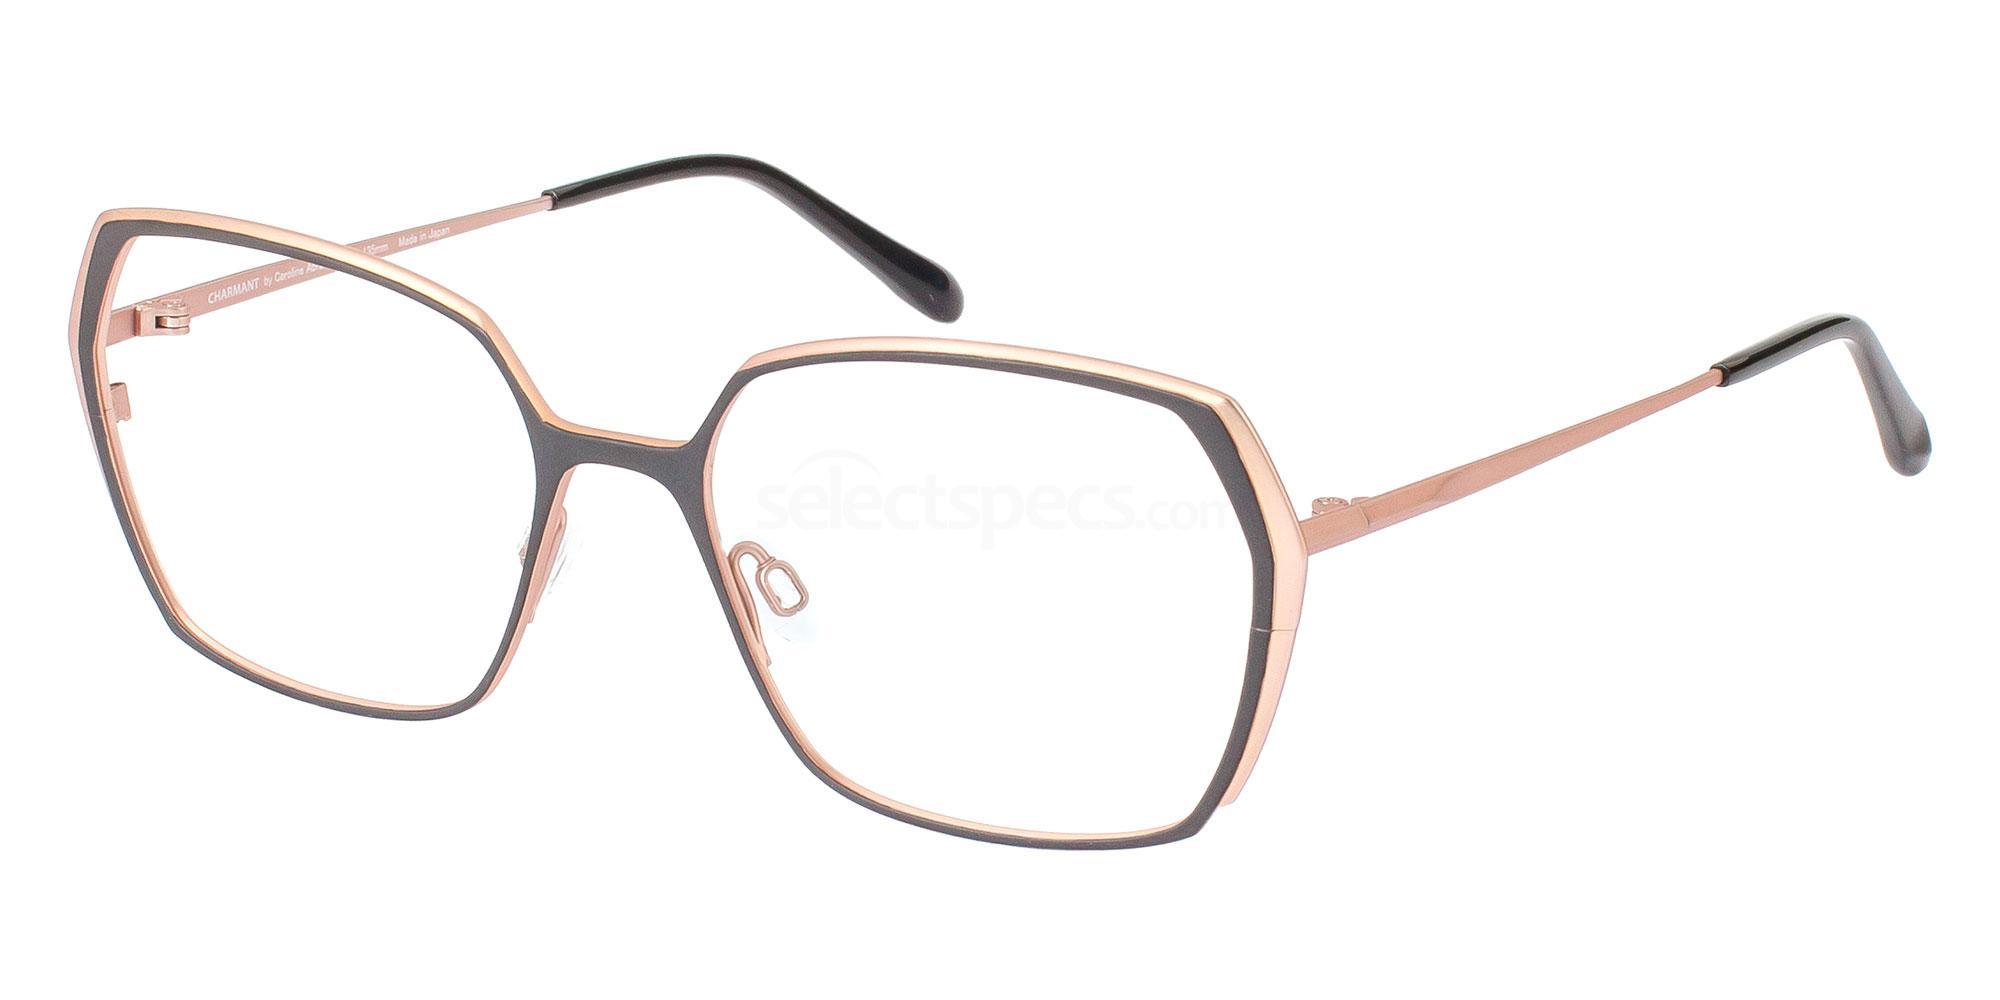 BK CH12557 Glasses, CHARMANT by Caroline Abram